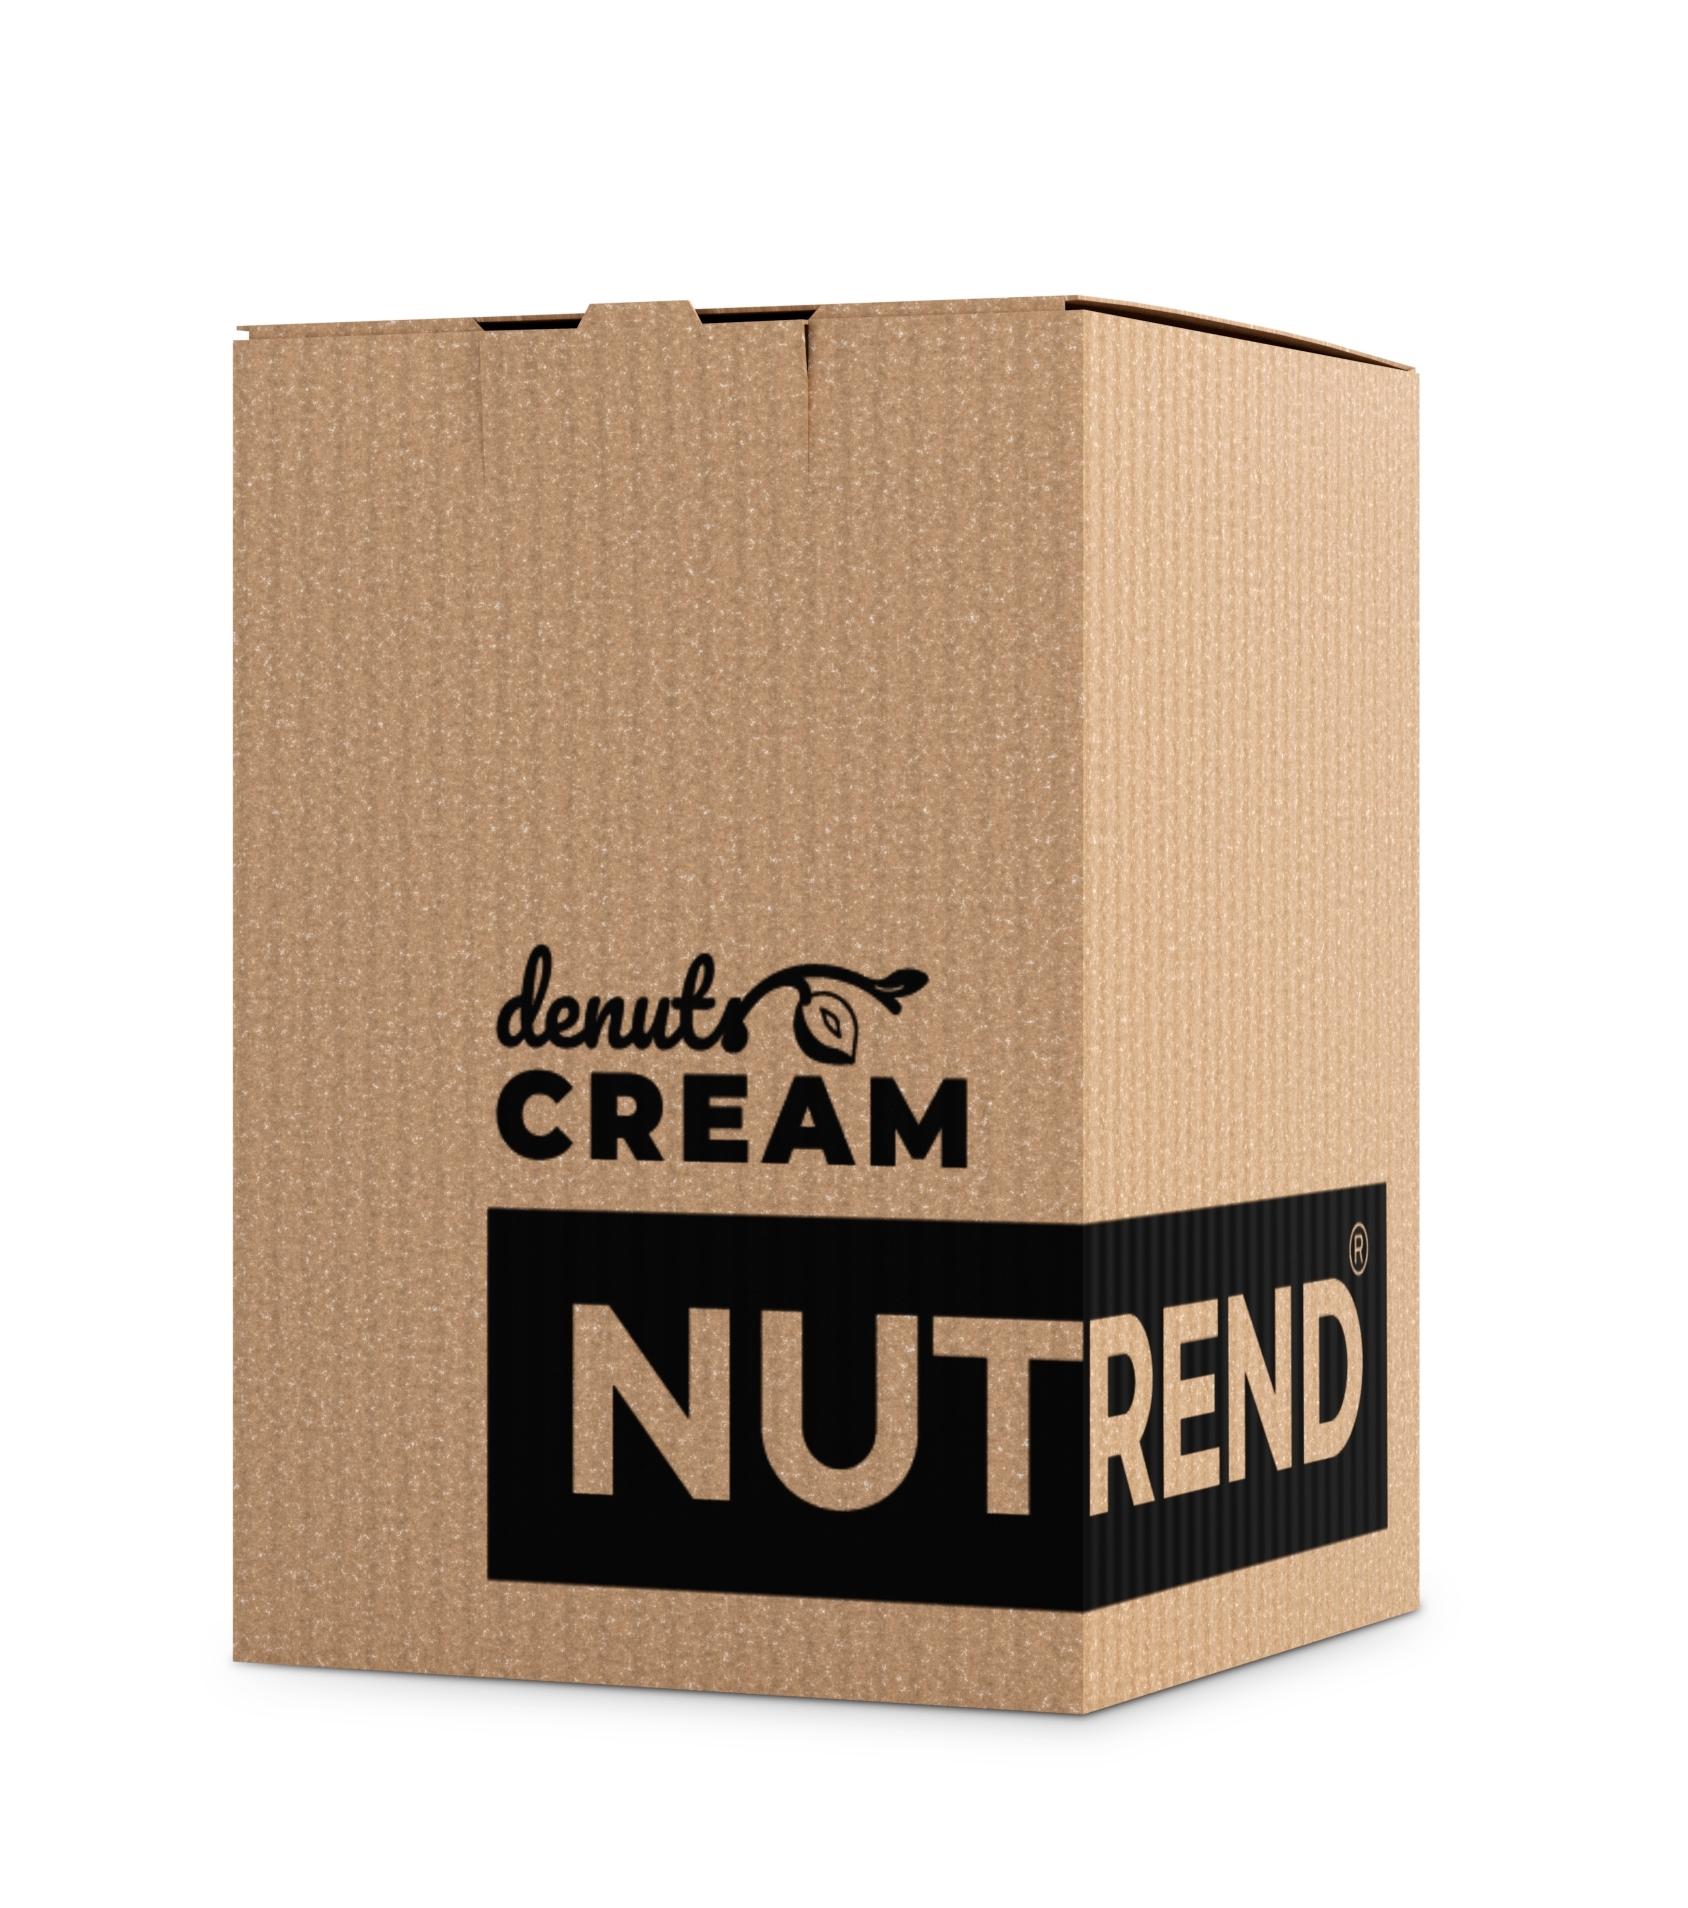 DENUTS CREAM 250 g, brownie